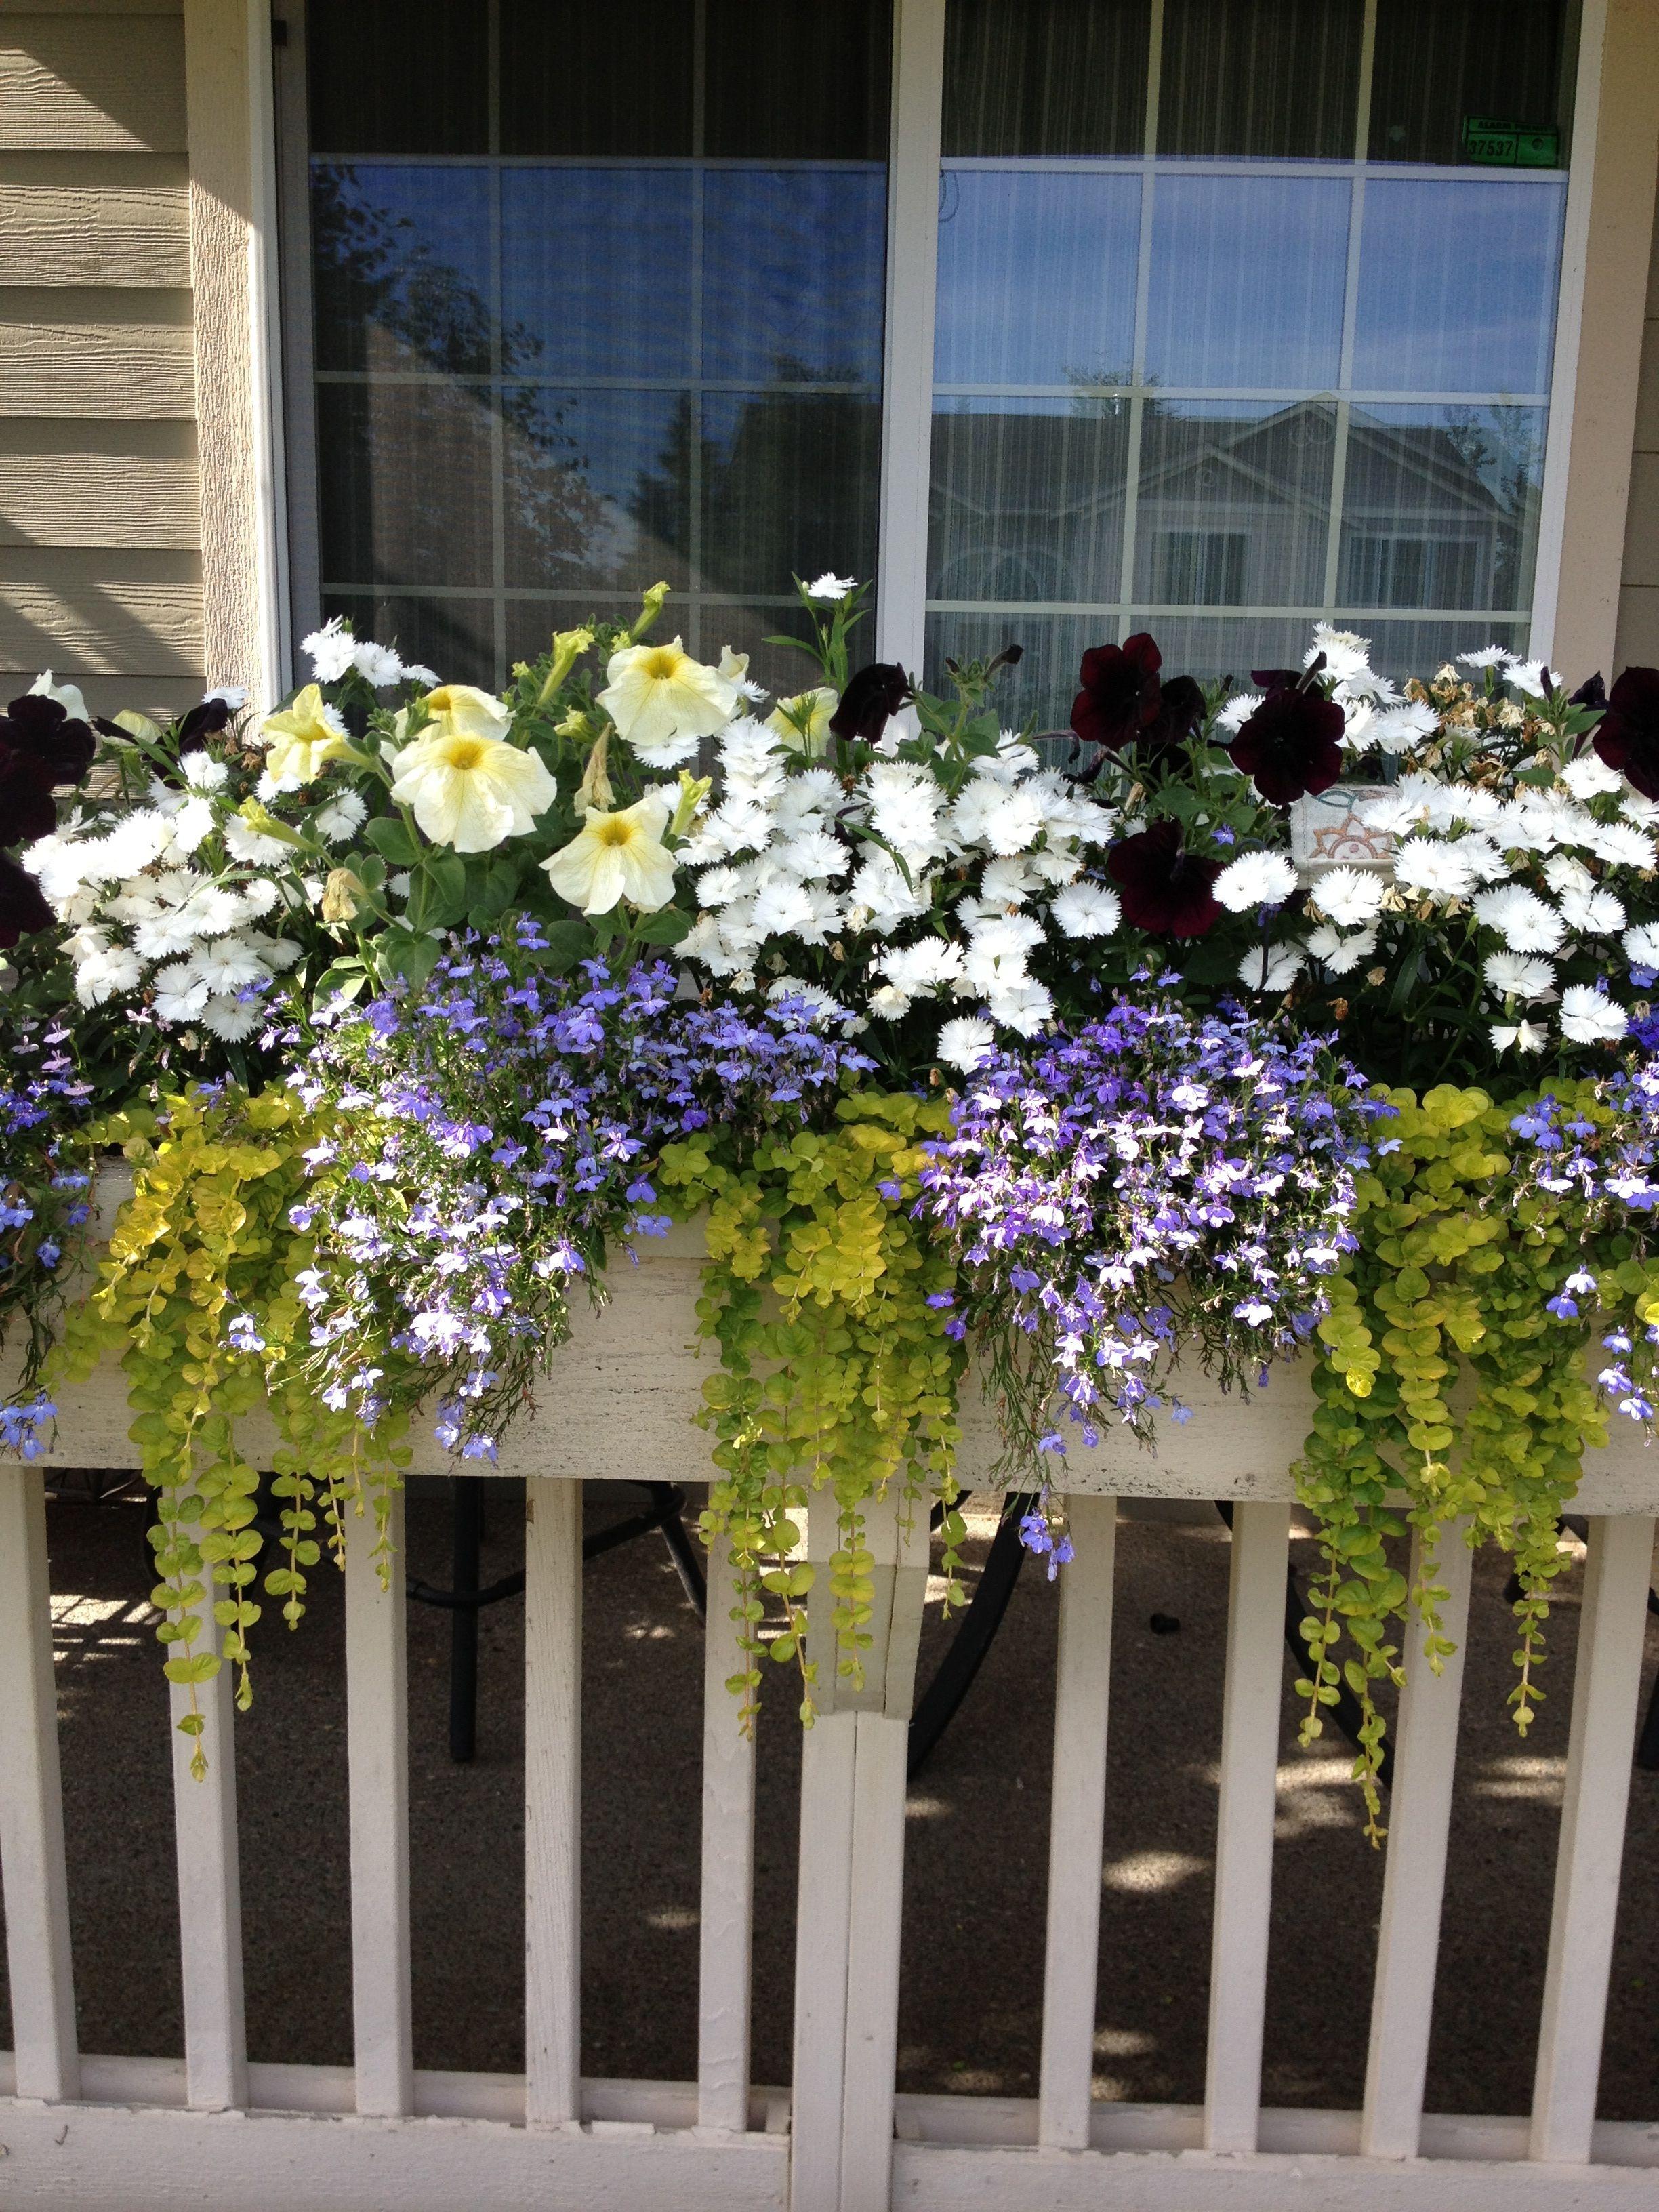 Front Porch Railing Flower Box Front Porch Flowers Porch Flowers Railing Flower Boxes